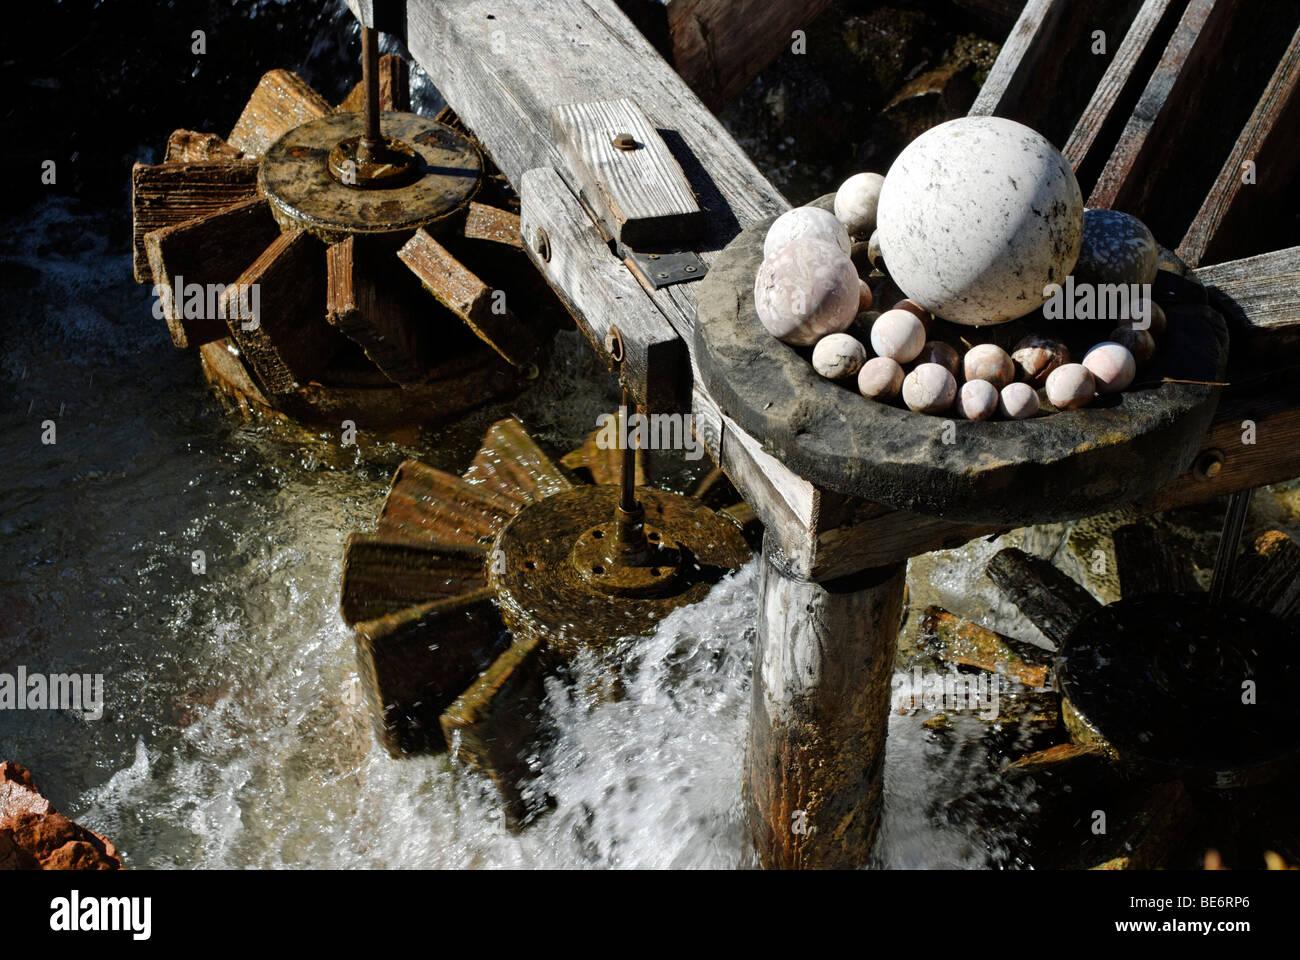 Stone ball mill Kugelmuehle an der Almbachklamm gorge near Marktschellenberg, Berchtesgadener Land, Upper Bavaria, - Stock Image